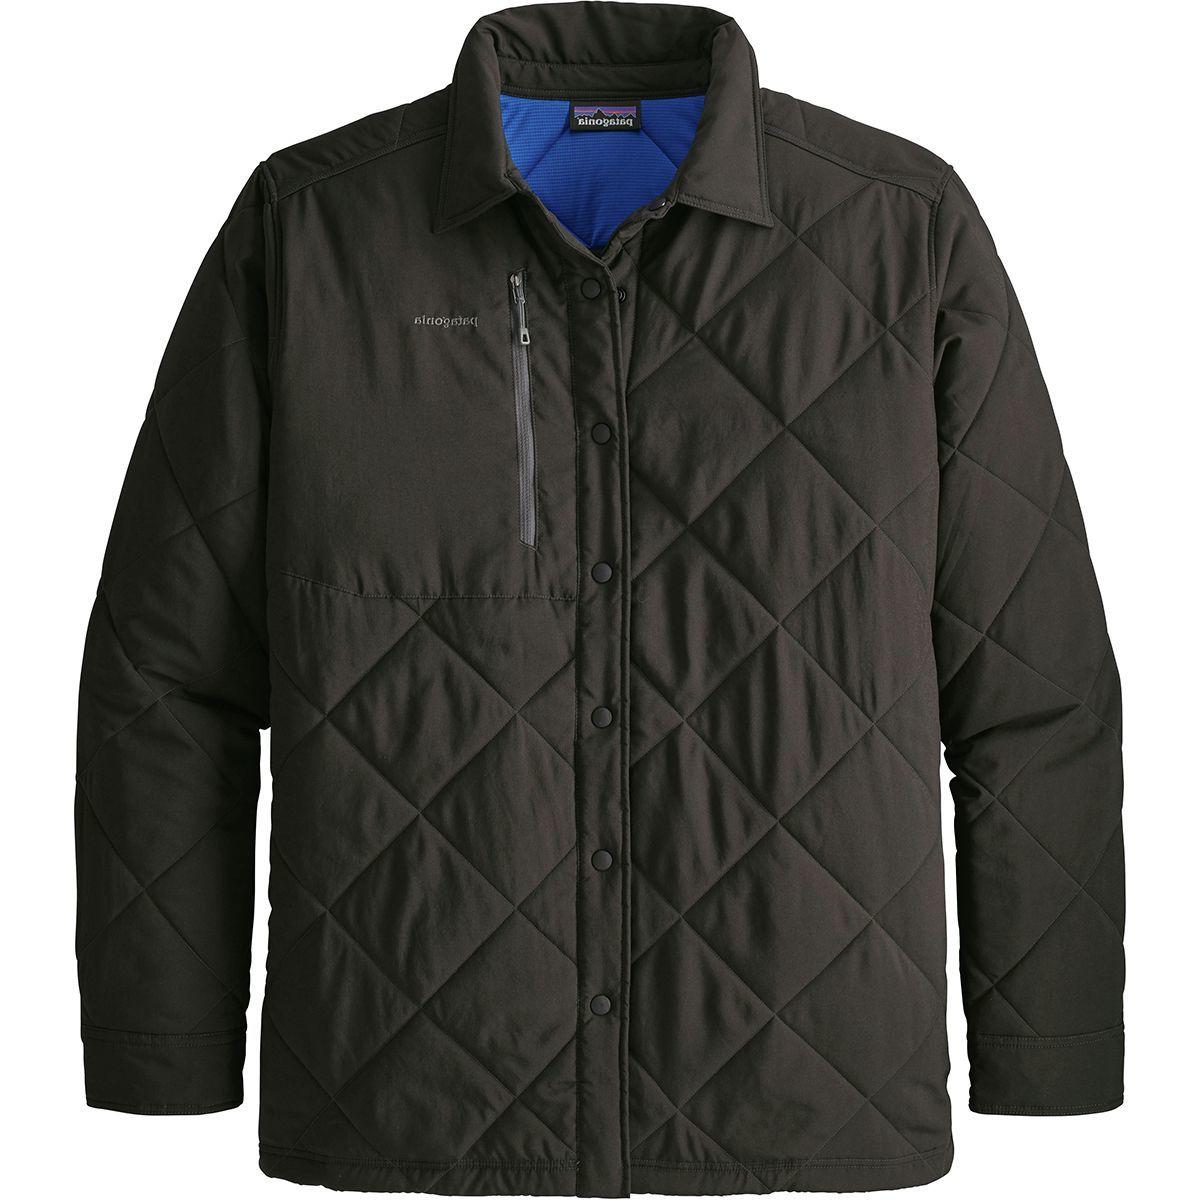 Patagonia Tough Puff Insulated Shirt - Men's